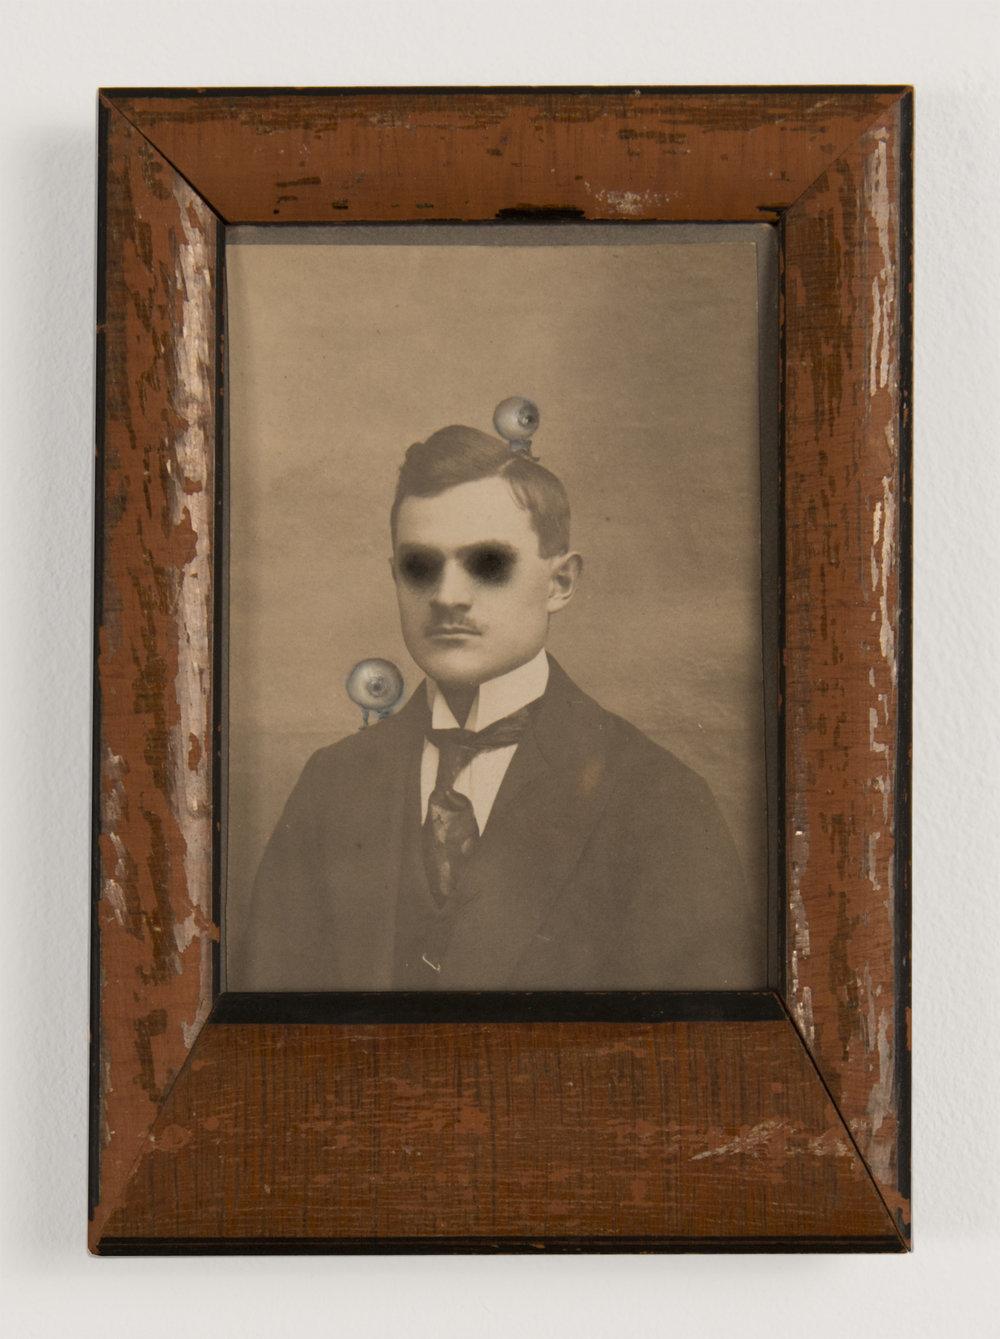 Jana Paleckova,  untitled (Eyeballs),  2015, oil paint on vintage photograph, 5h x 3 1/2w in.